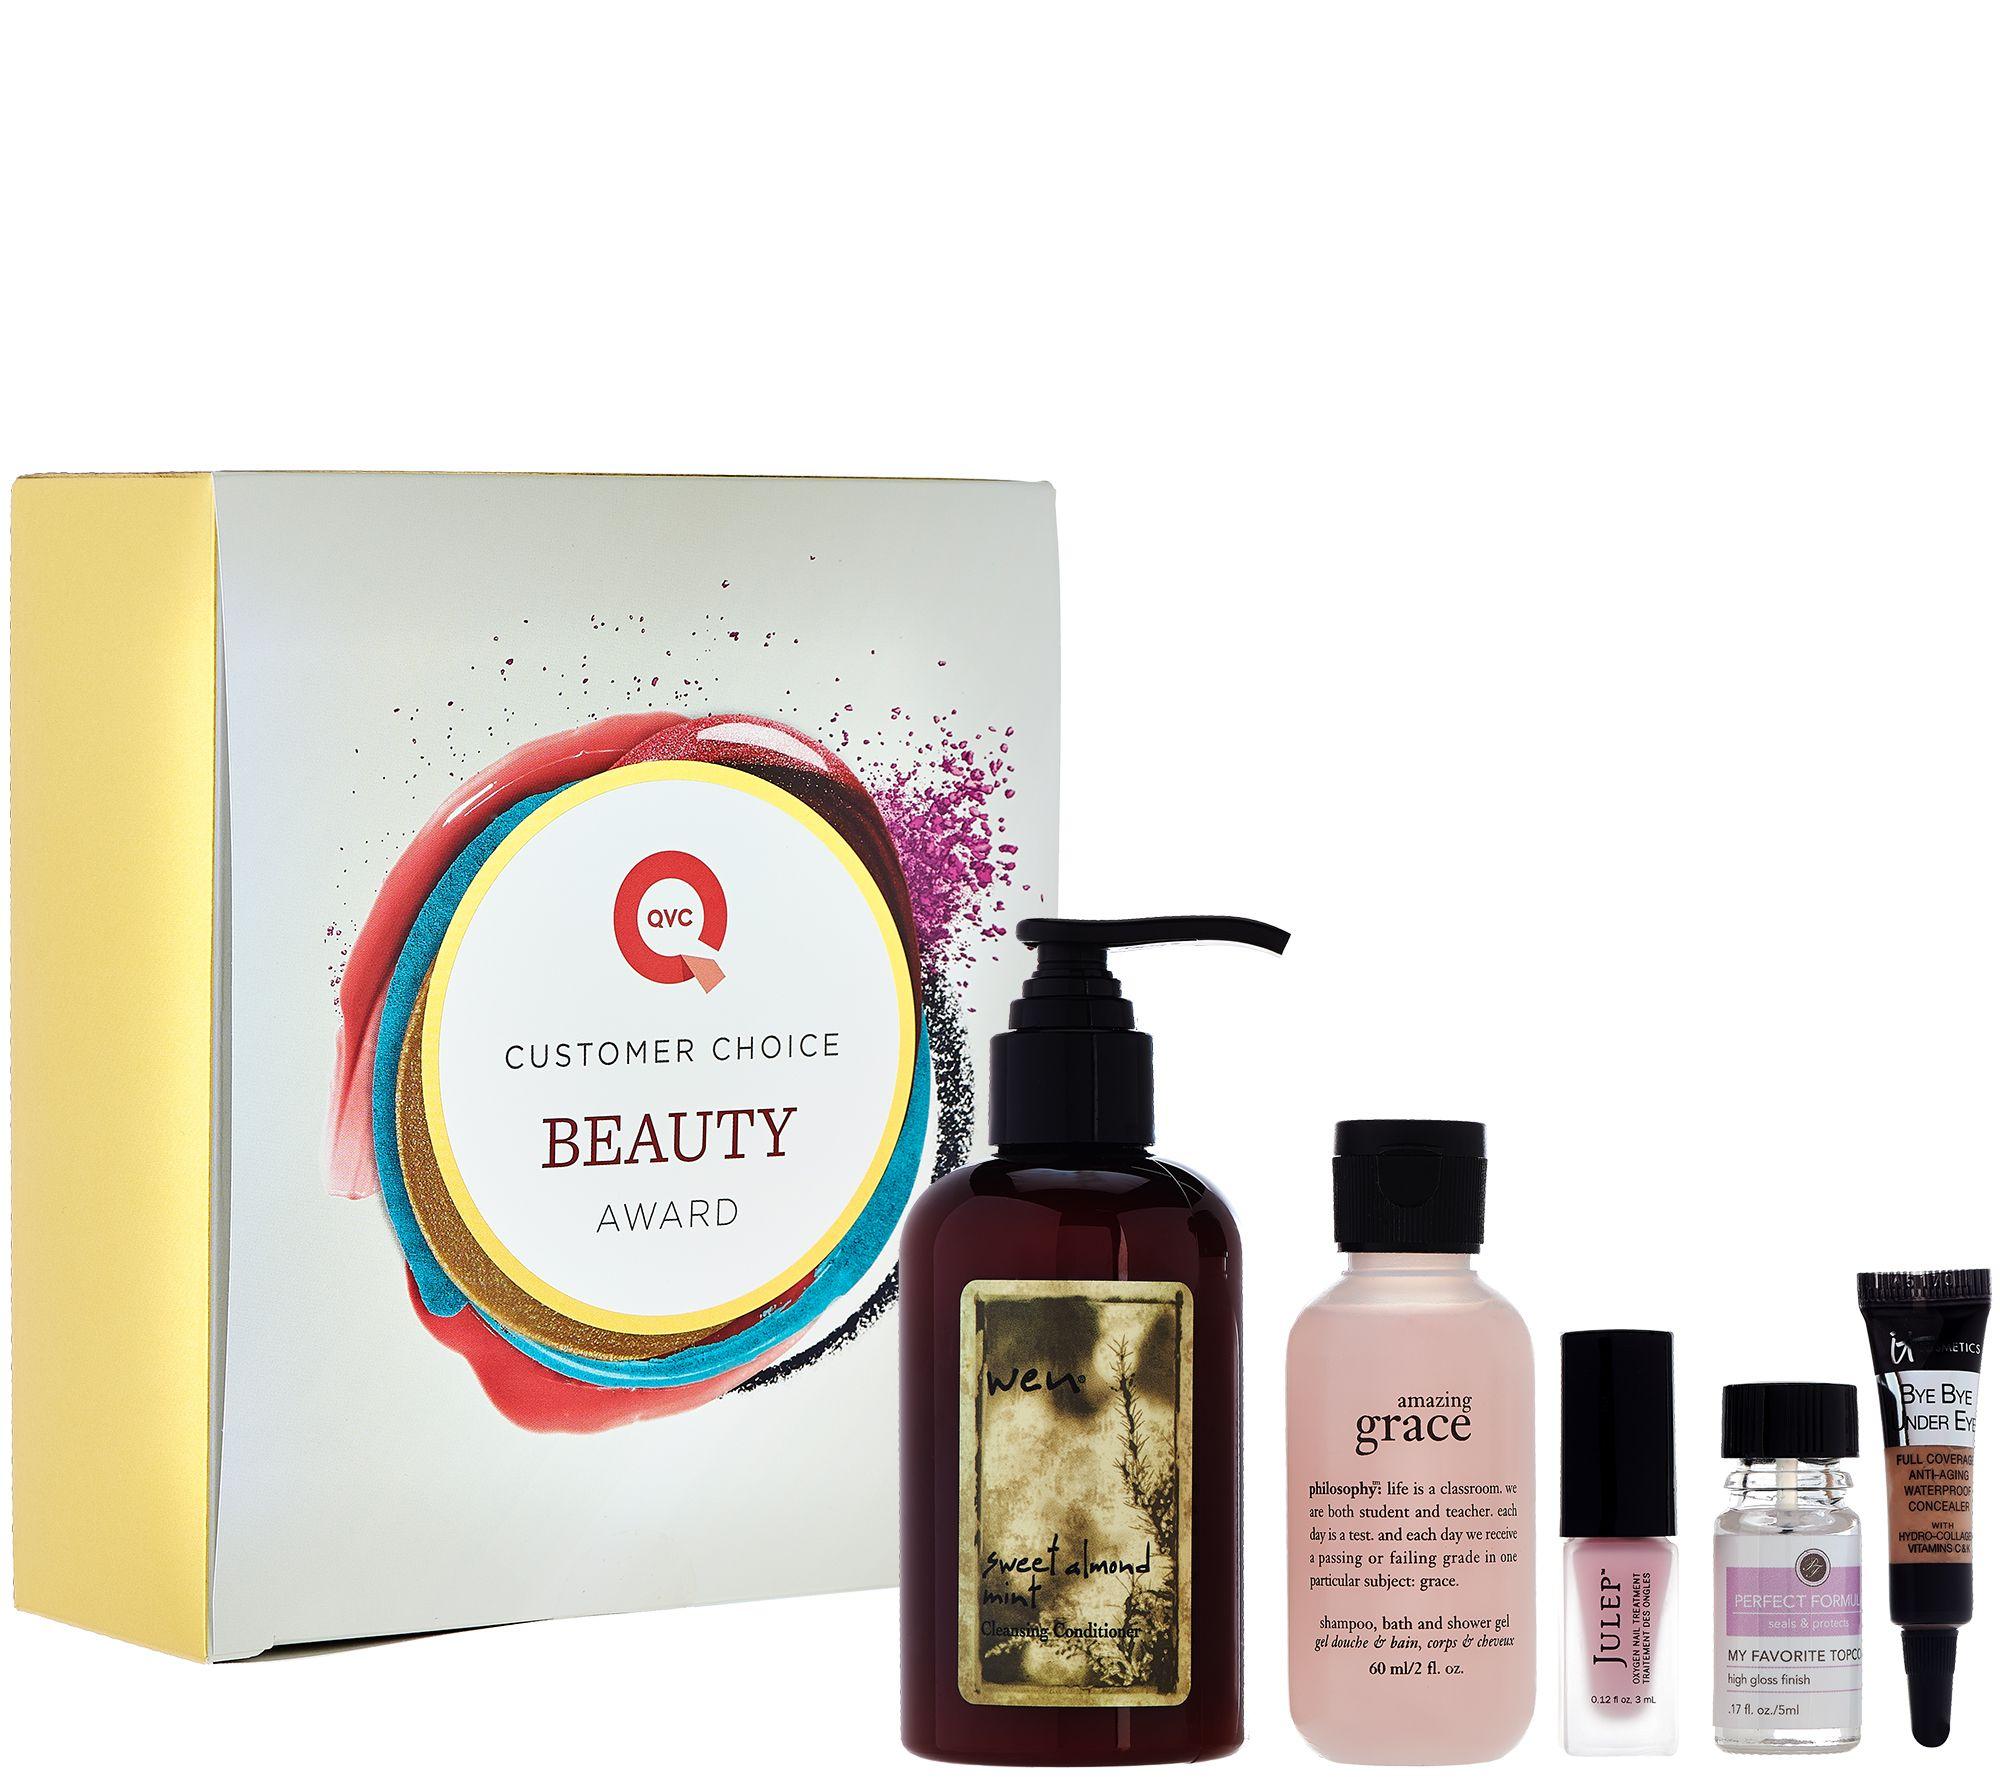 QVC Beauty Customer Choice Award Winner 5-pc Collection - Page 1 ...